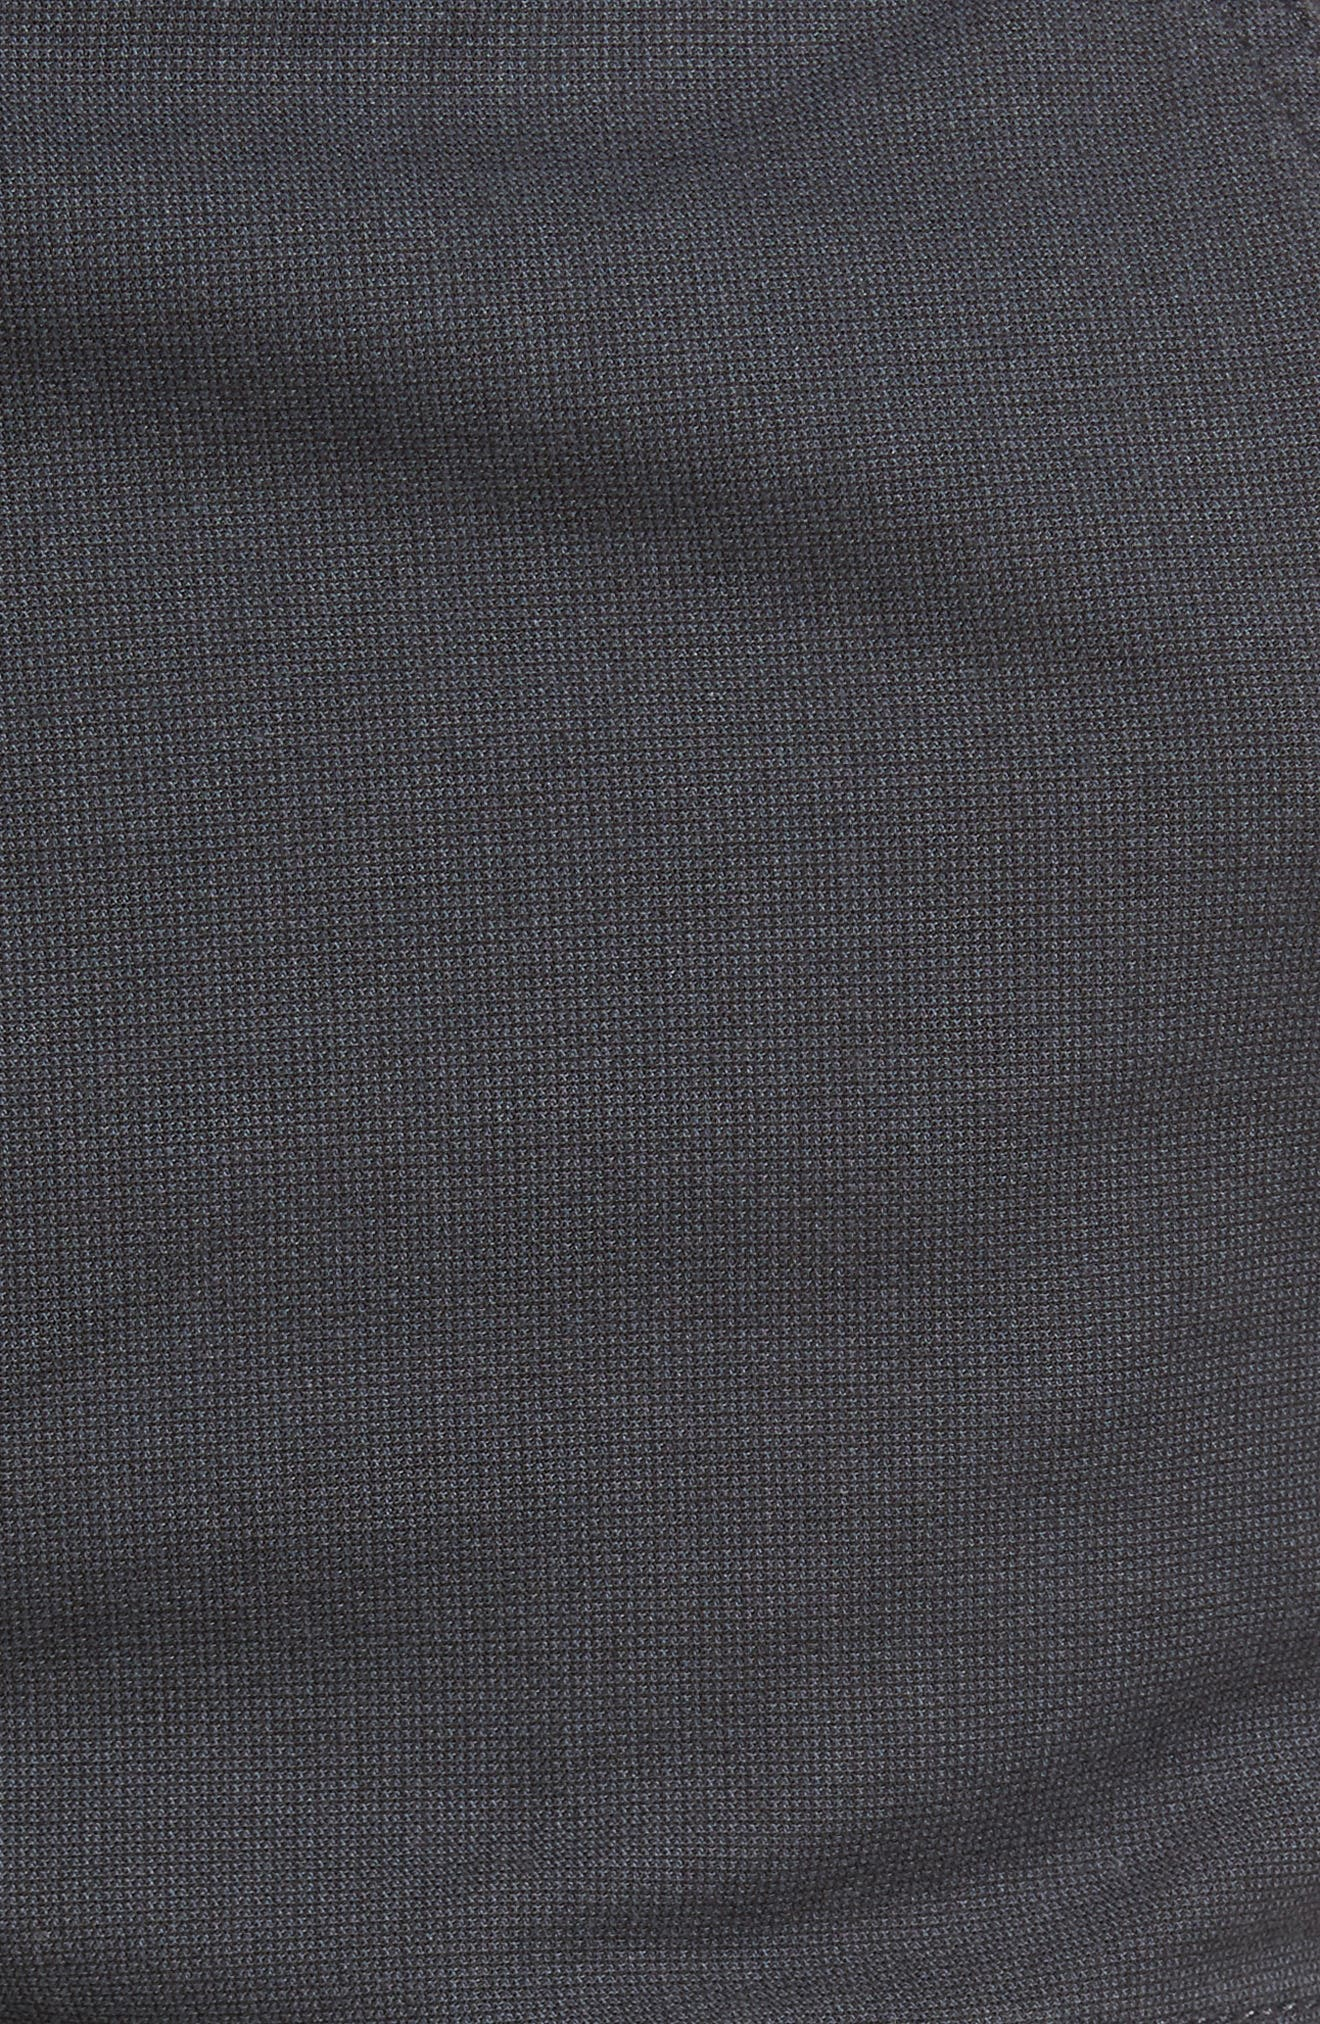 Ludstone Cargo Shorts,                             Alternate thumbnail 5, color,                             Blue Graphite